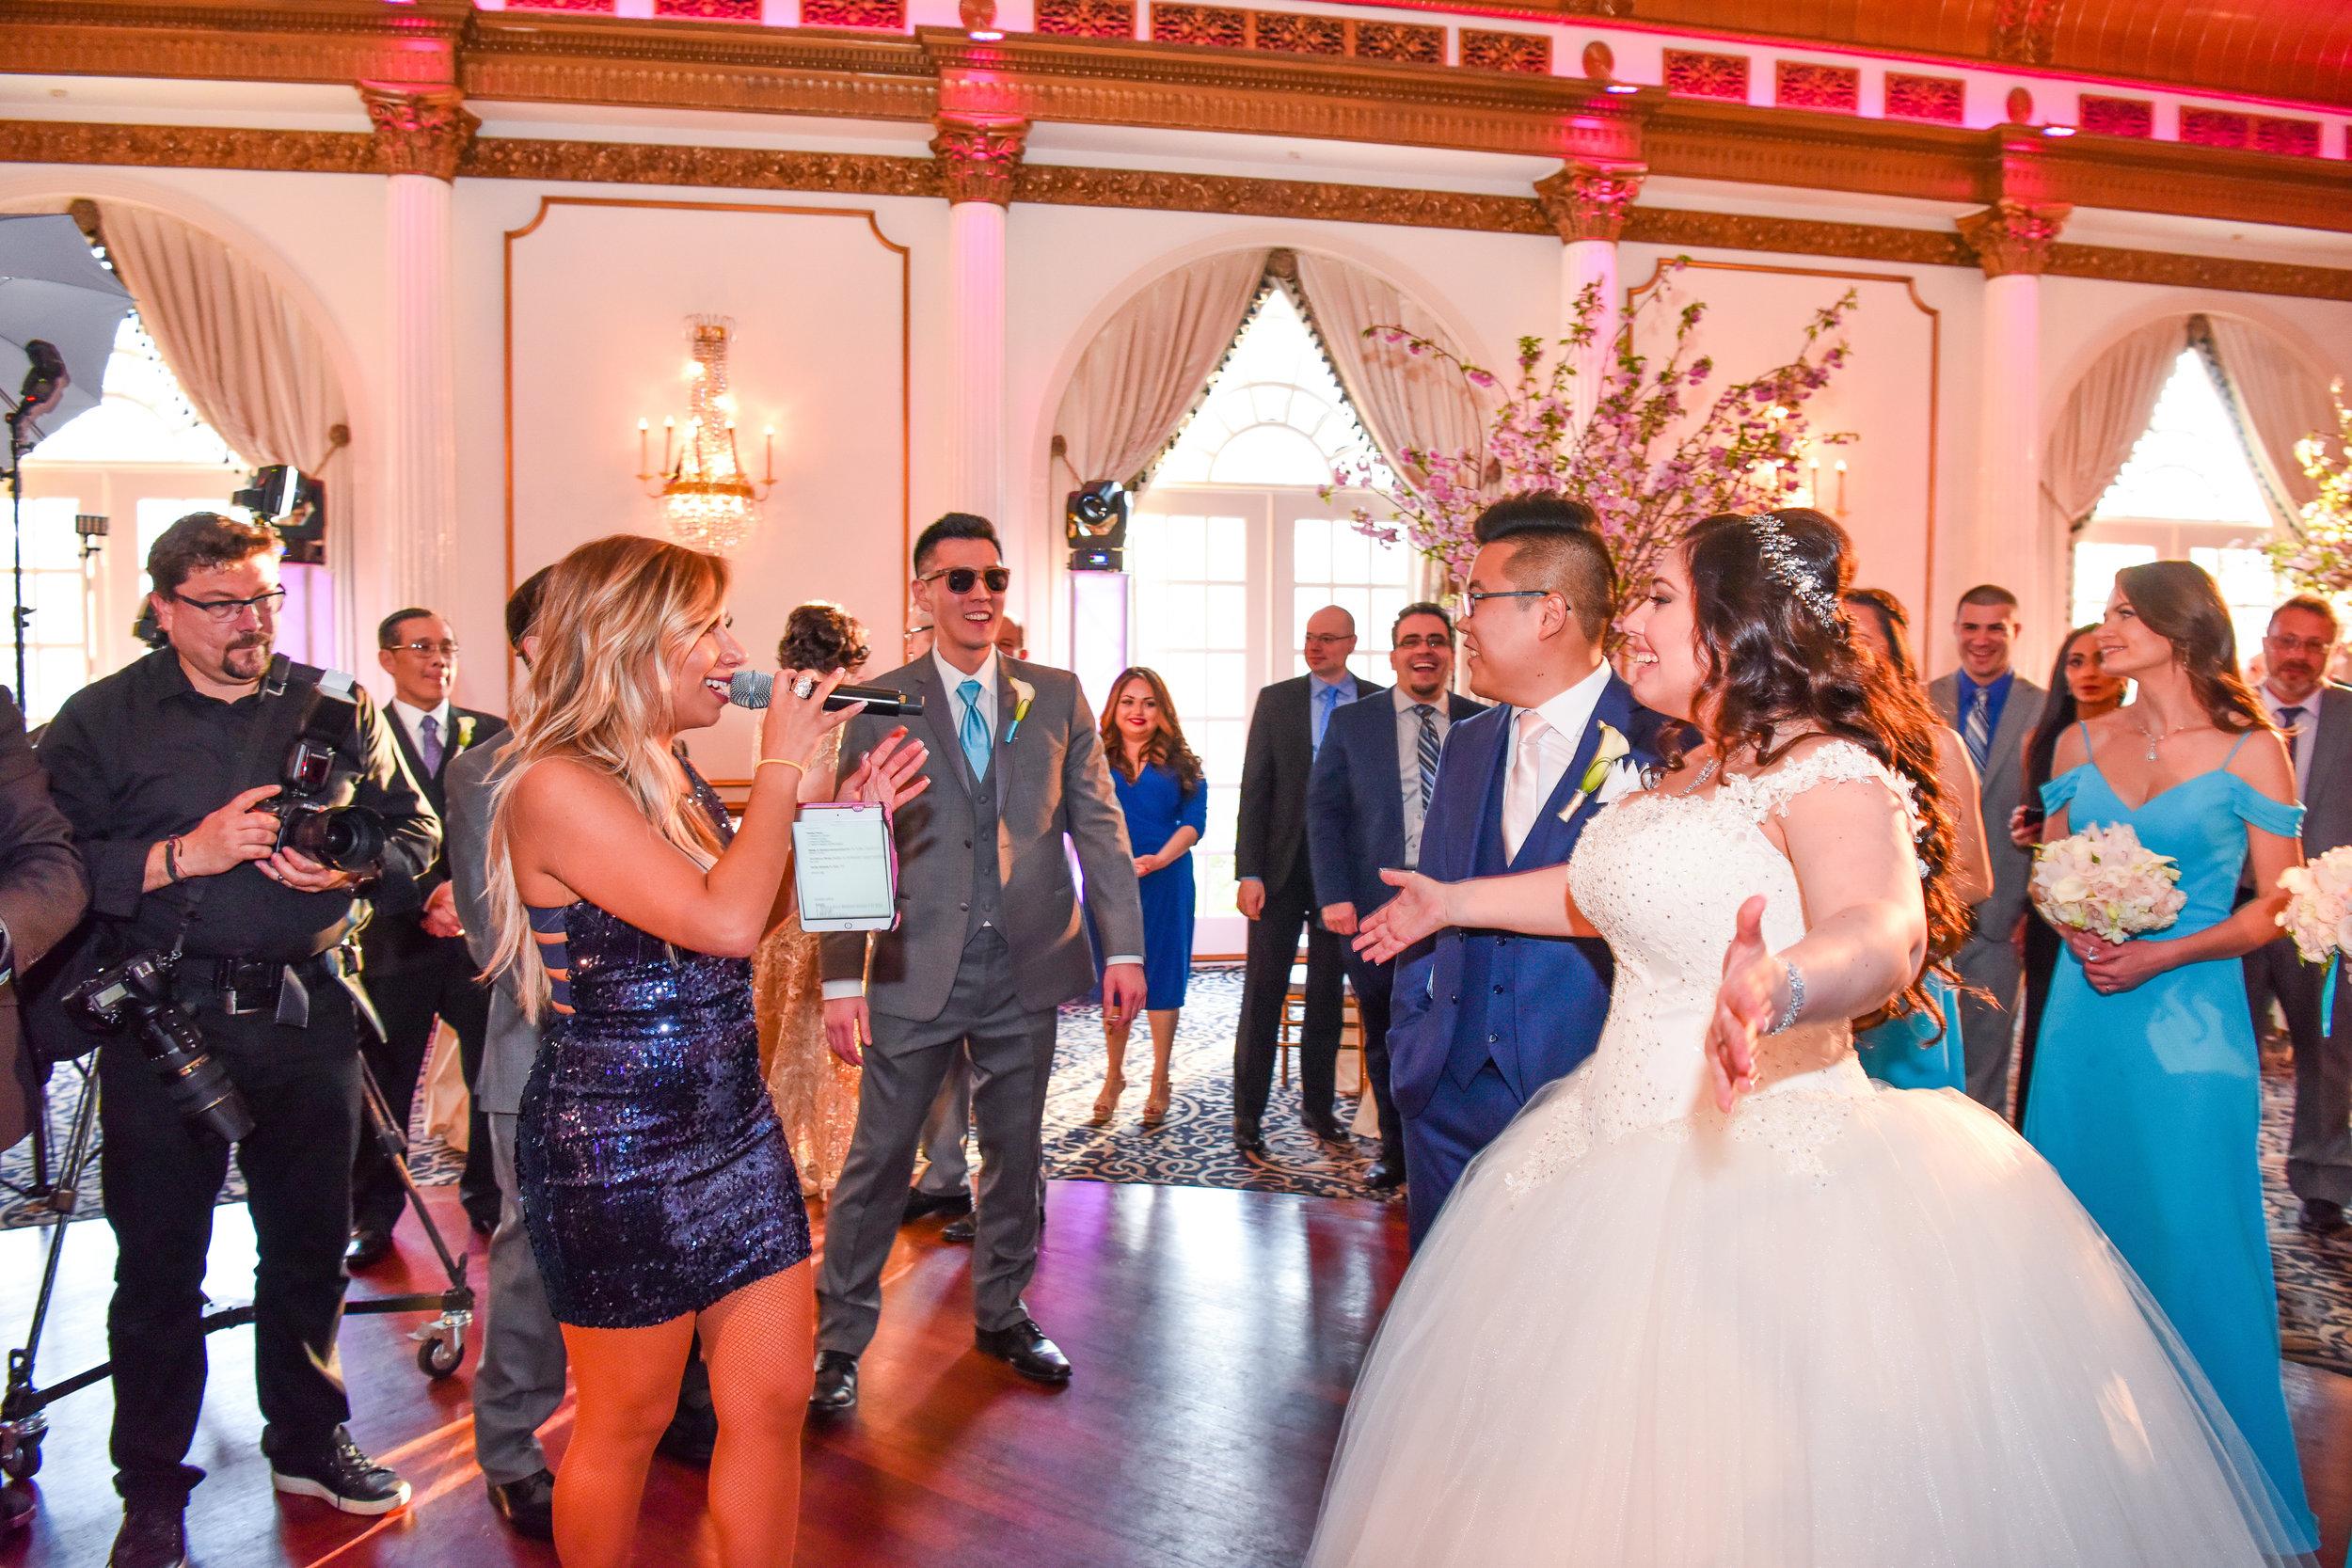 Alex Edge Crystal Playza NJ Wedding JBL VRX System